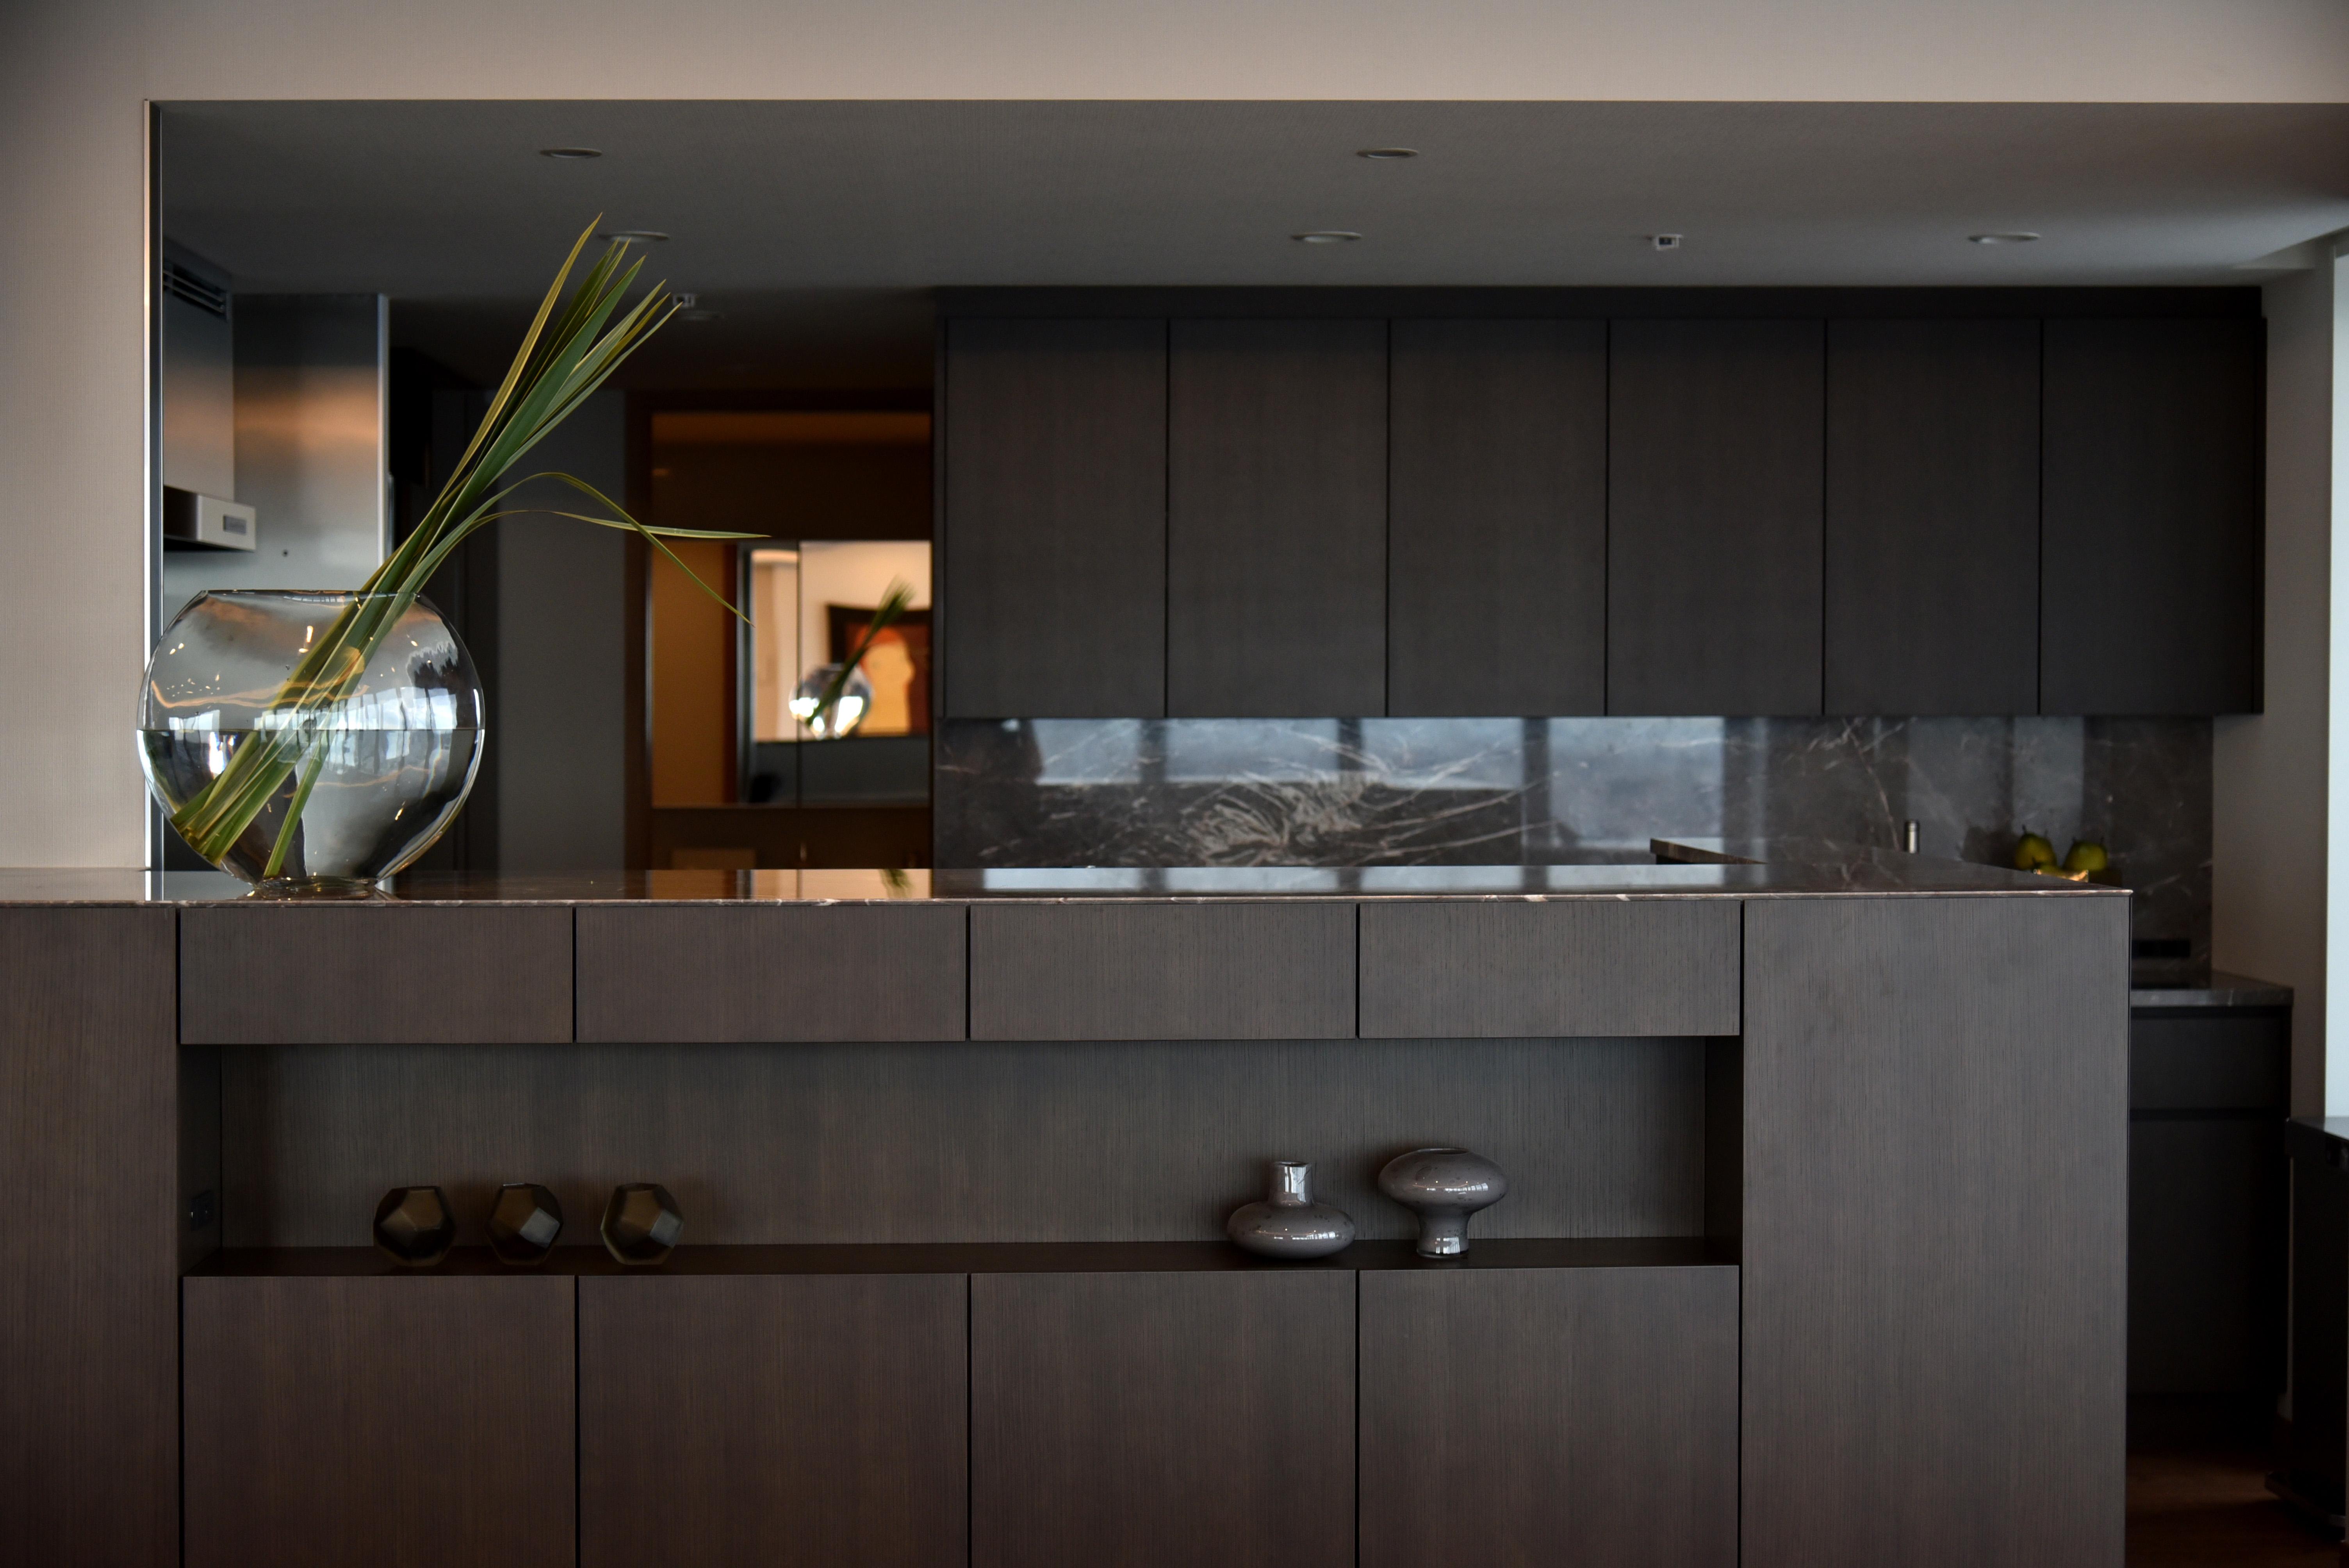 Bespoke Kitchen,storage,  Marble Stone, fixture, Built-in furniture